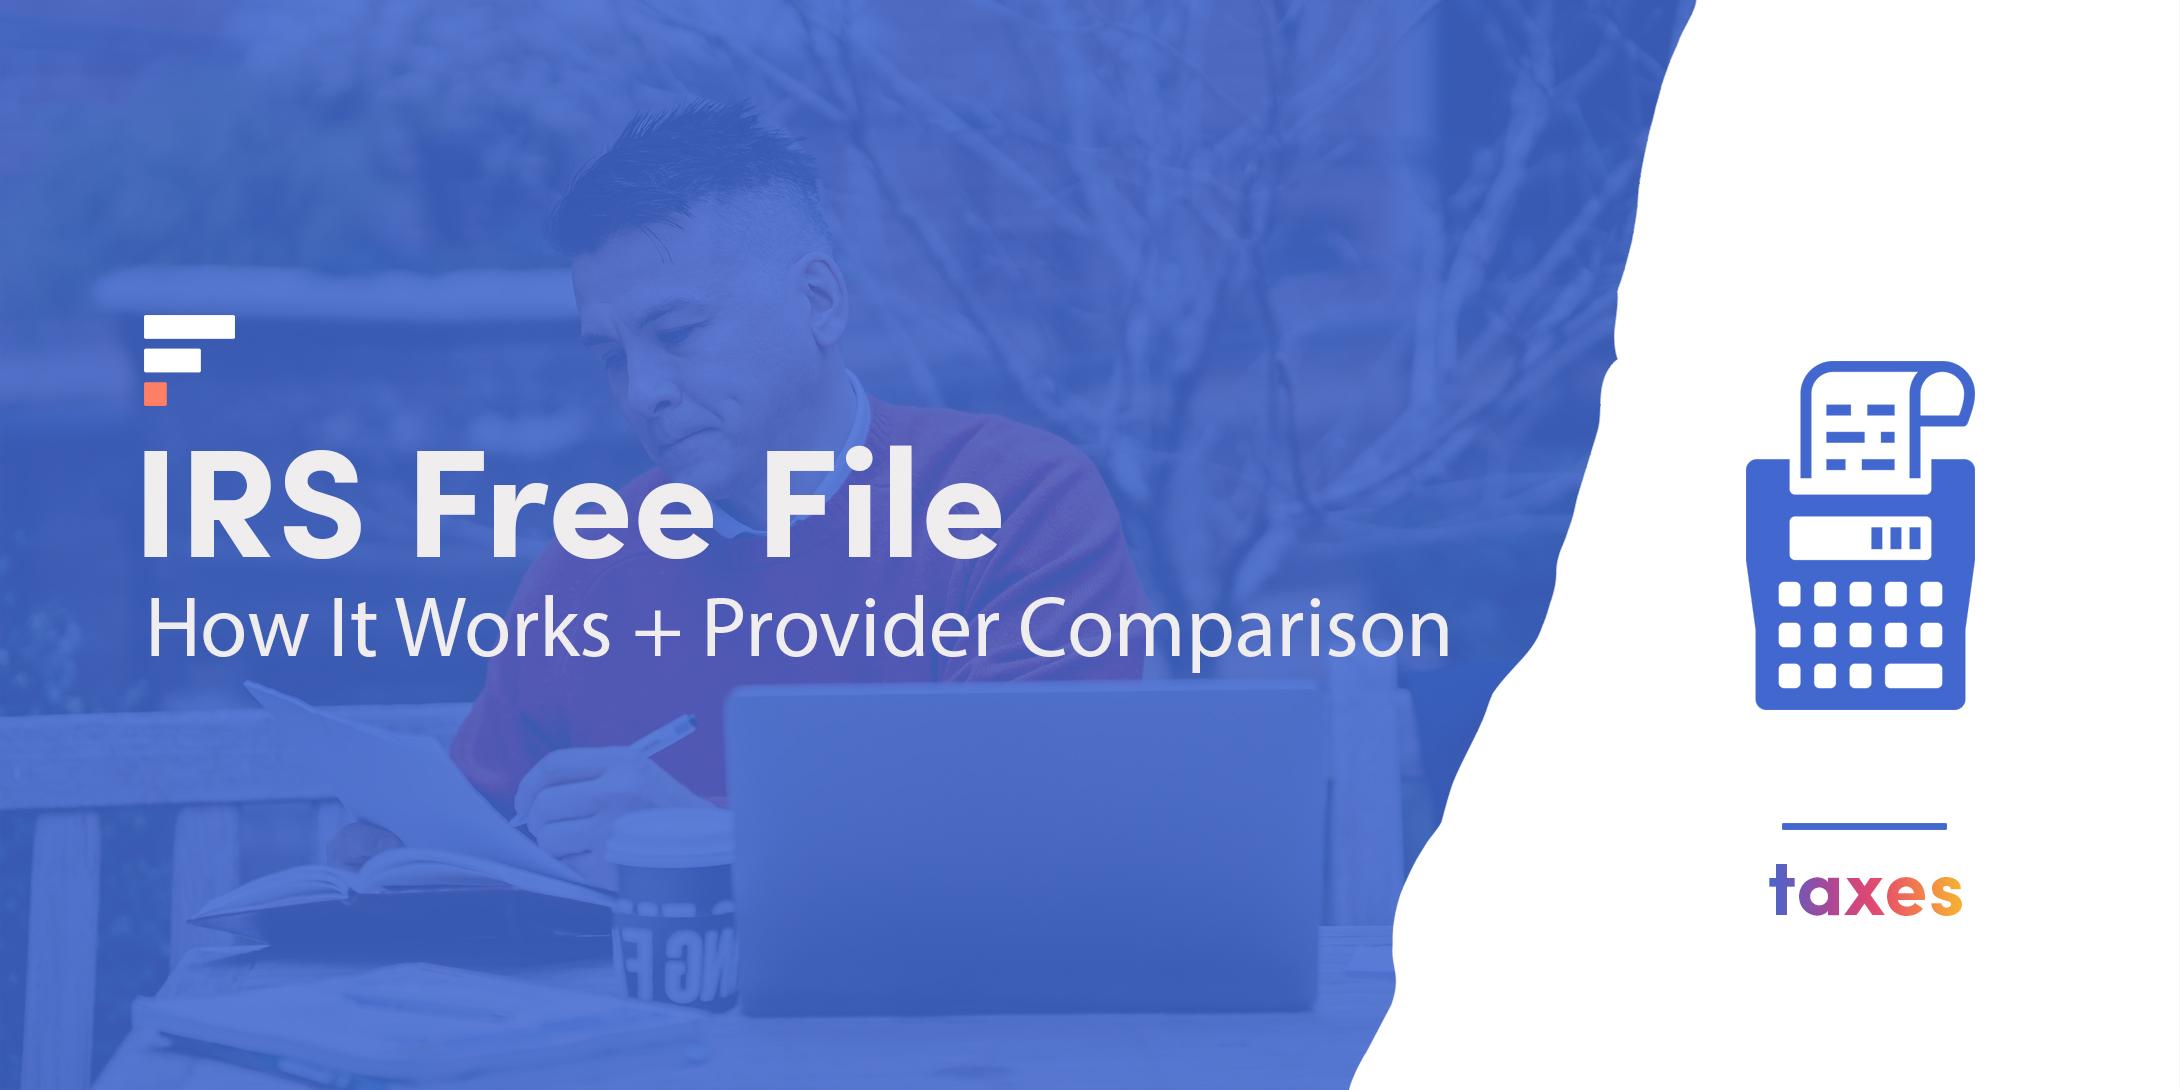 IRS Free File